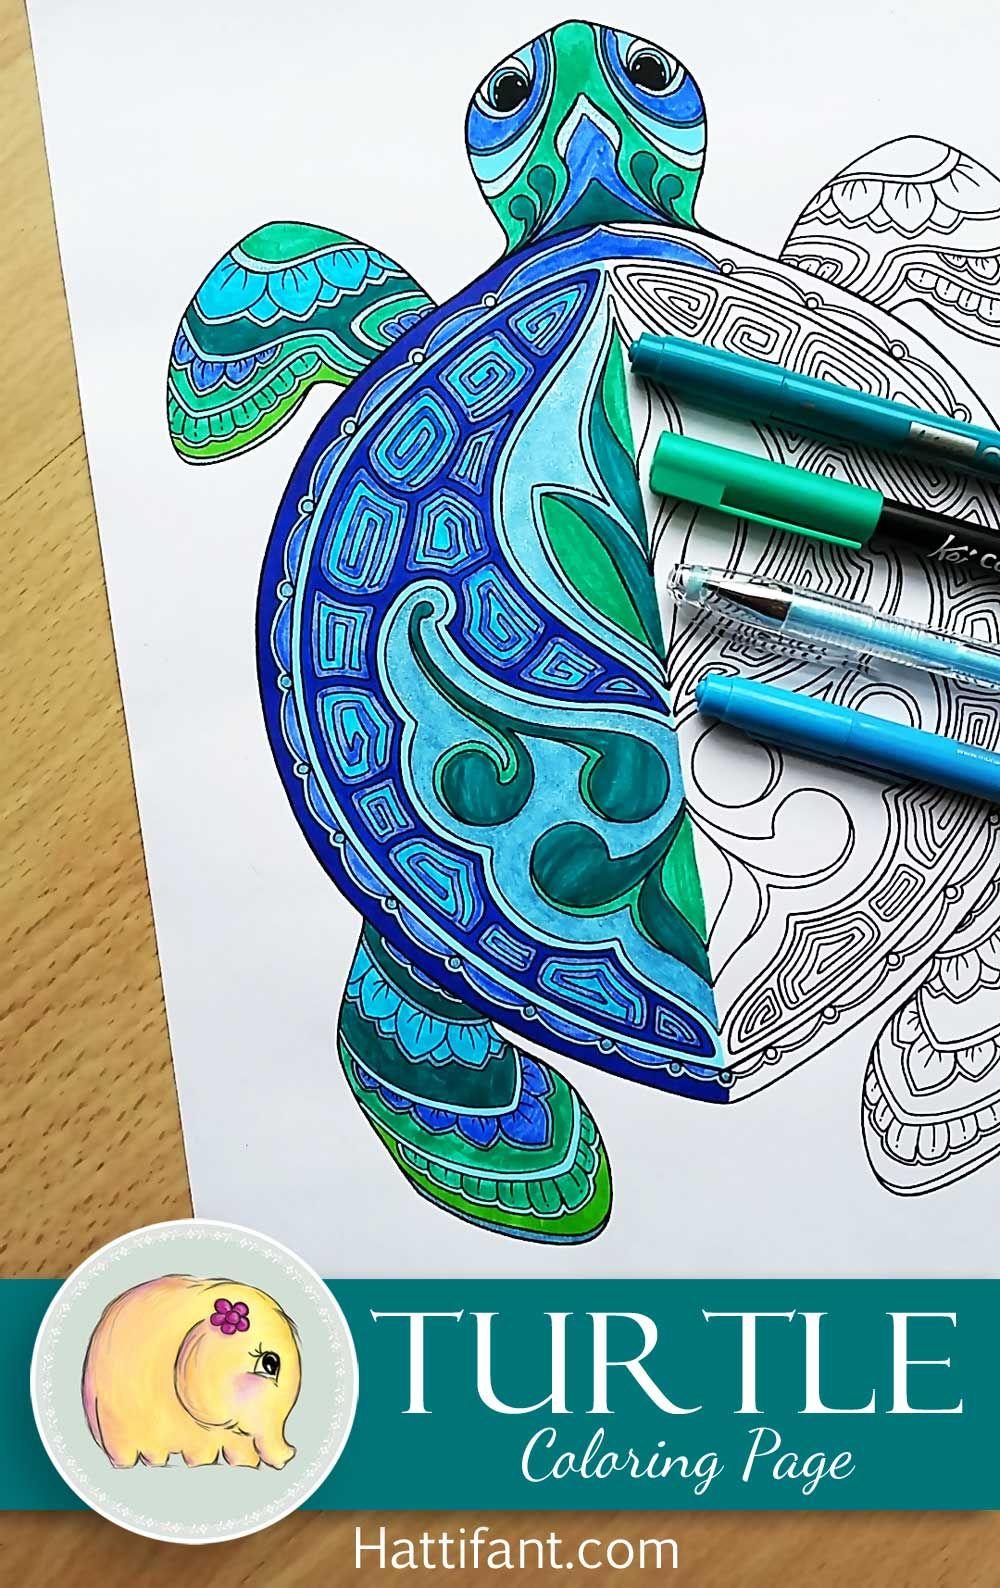 Hattifant S Turtle Coloring Page Hattifant Turtle Coloring Pages Coloring Pages Abstract Coloring Pages